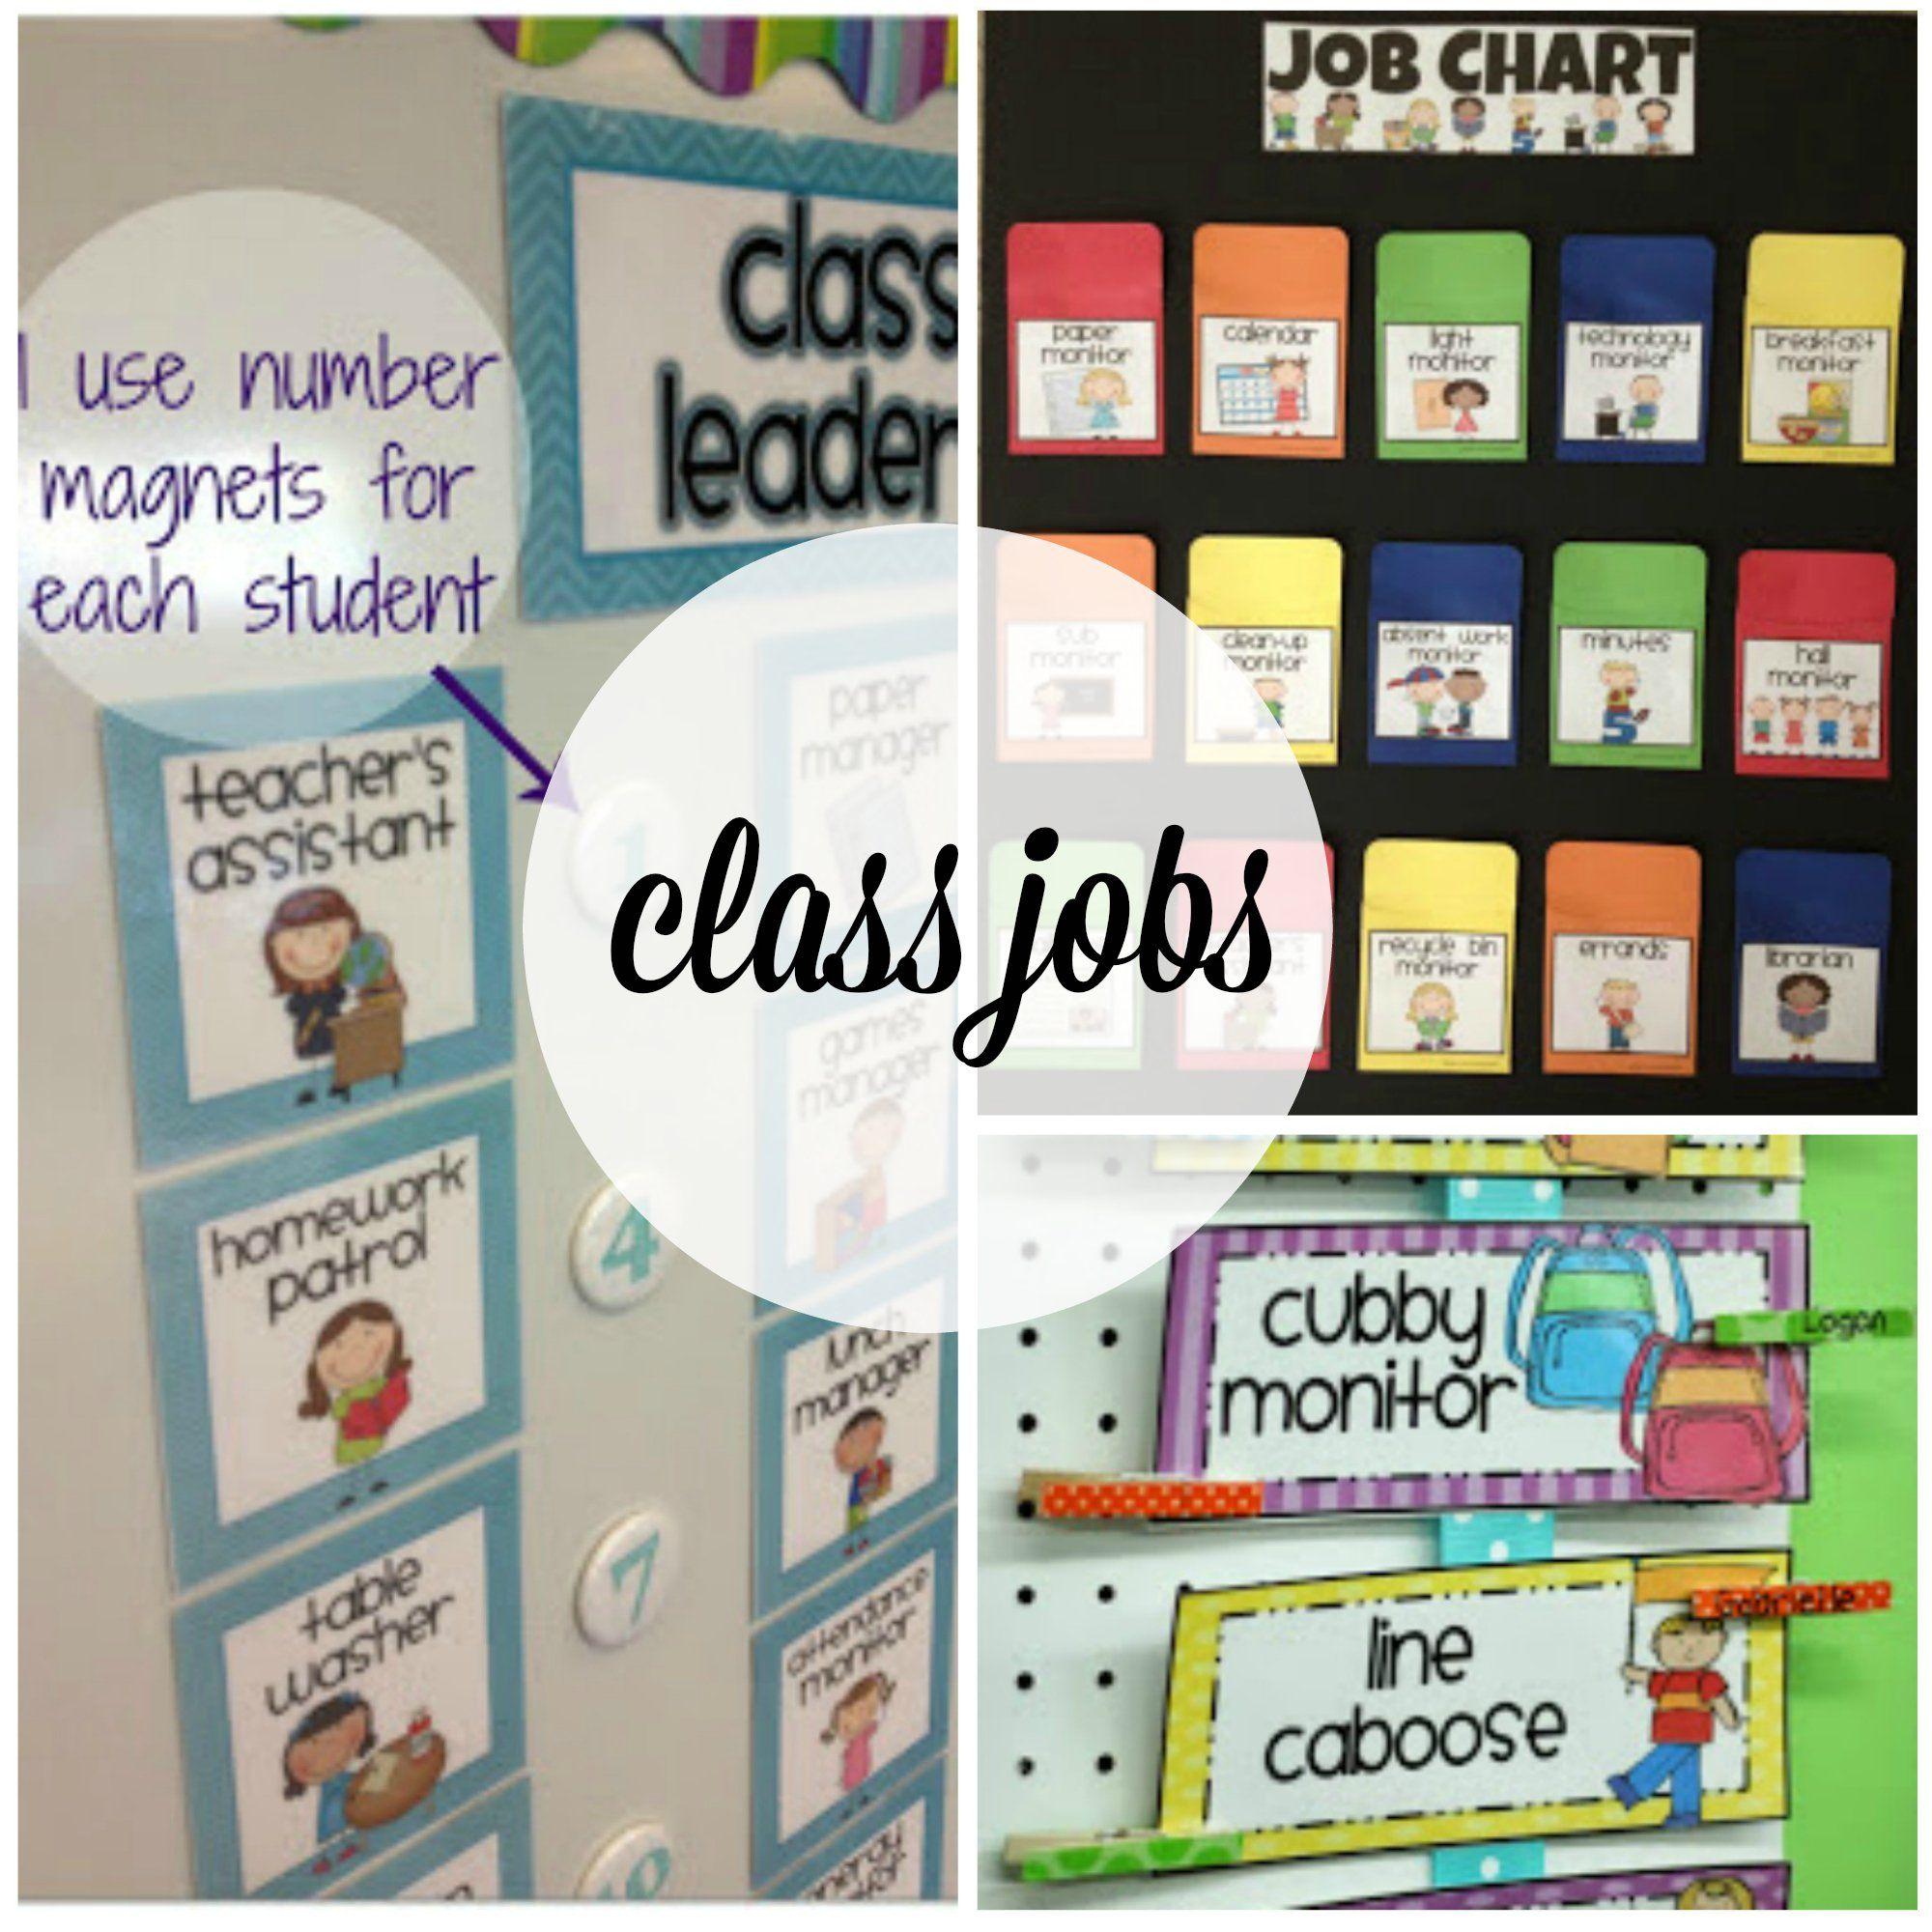 Classroom procedures classroom organization classroom management - 32 Must Try Classroom Management Tips